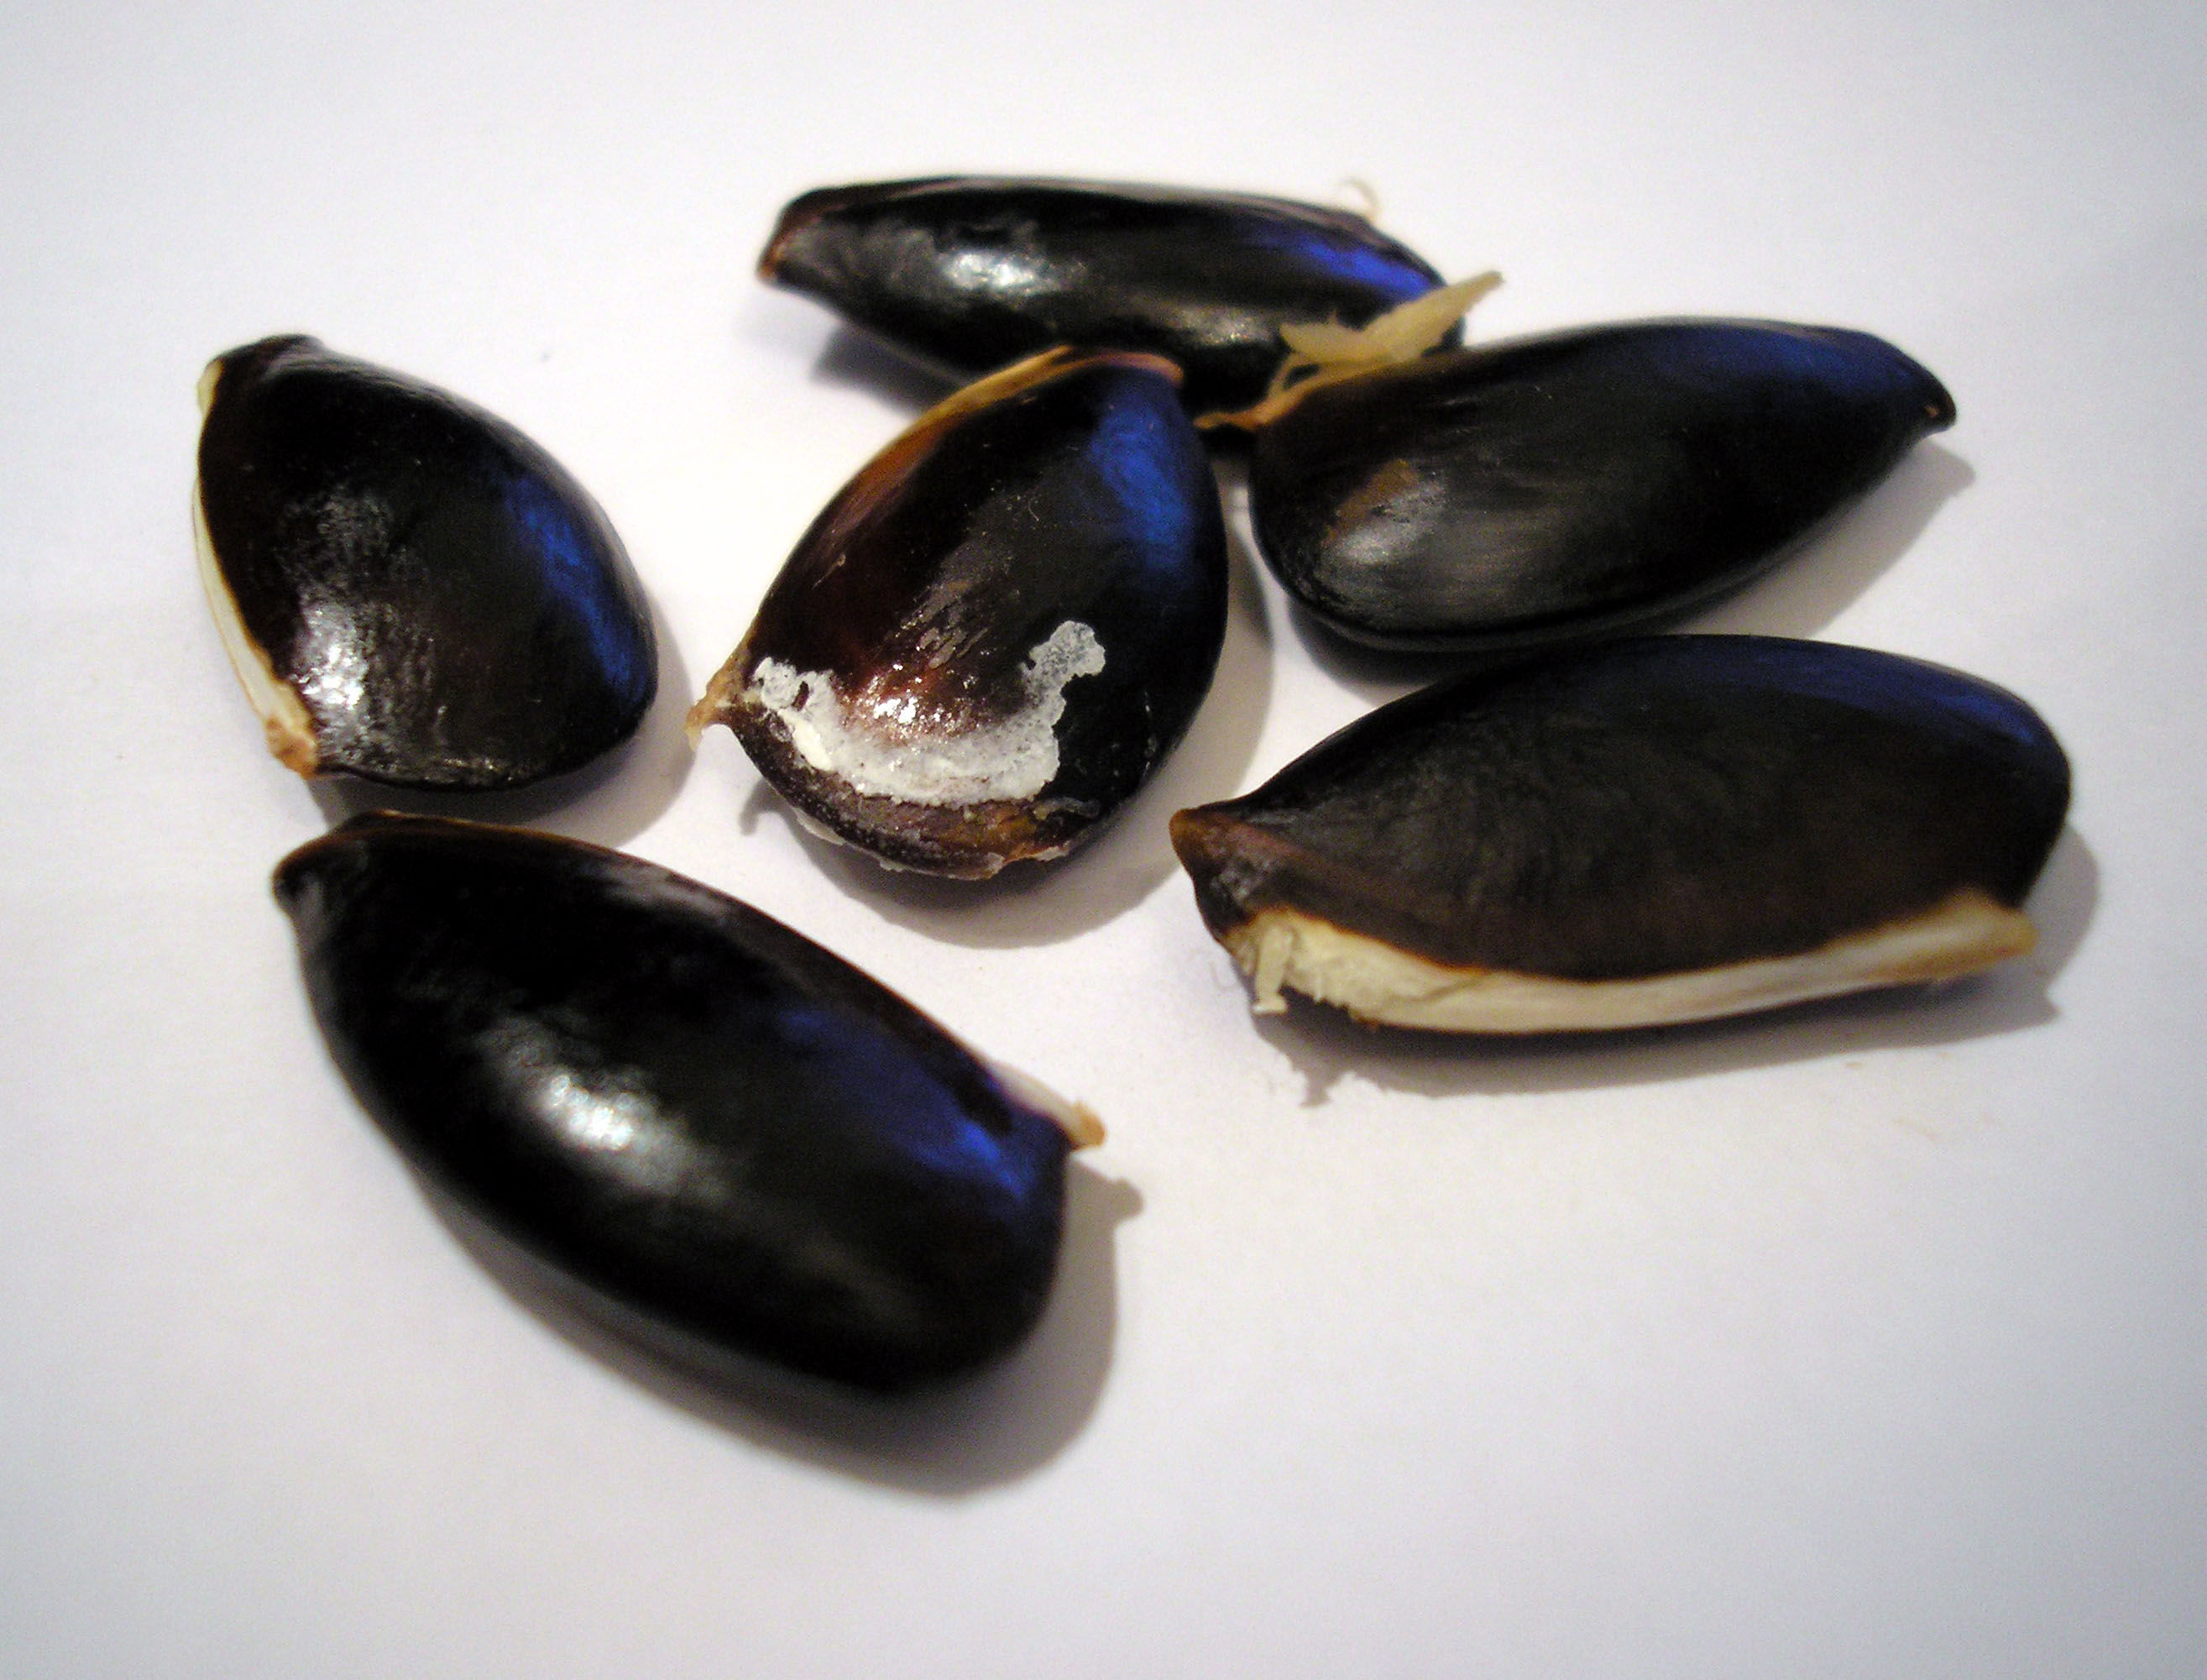 Seeds-of-Sapodilla